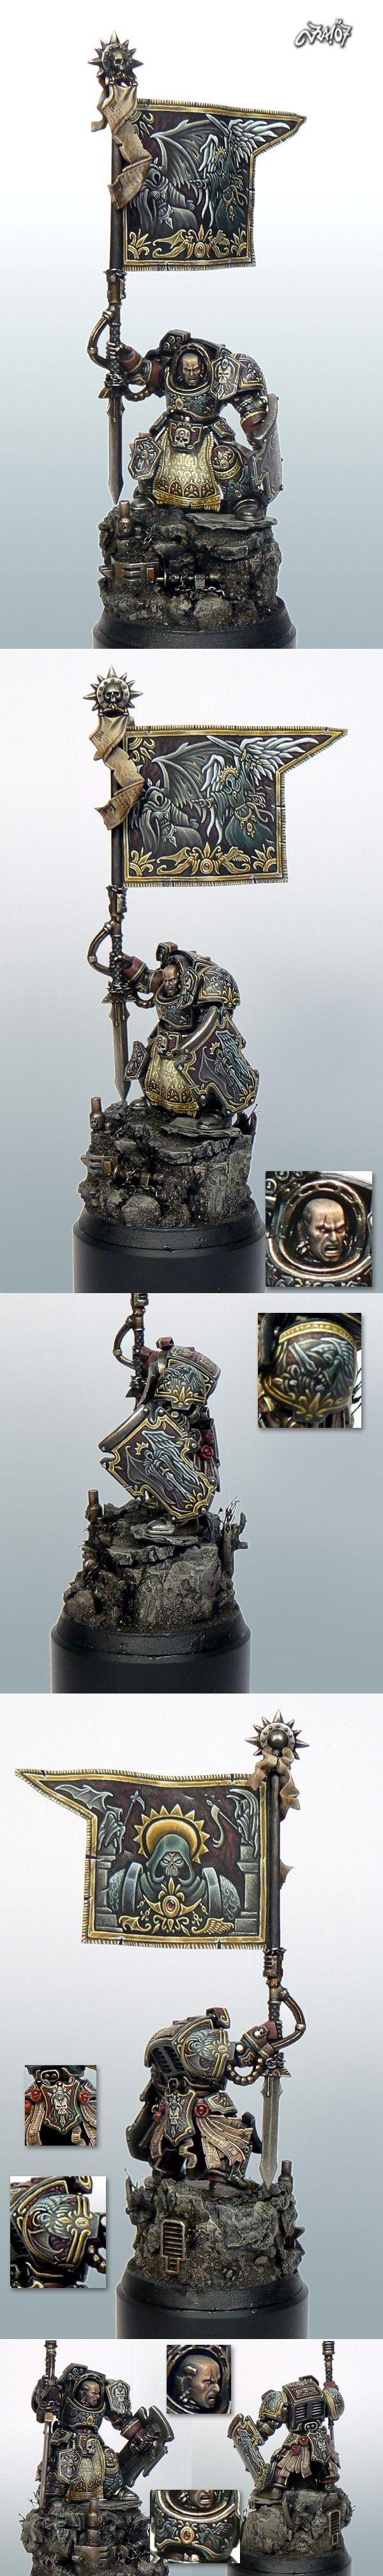 ITALY 2007 - Warhammer 40,000 Single Miniature - Demon Winner, the unofficial Golden Demon website